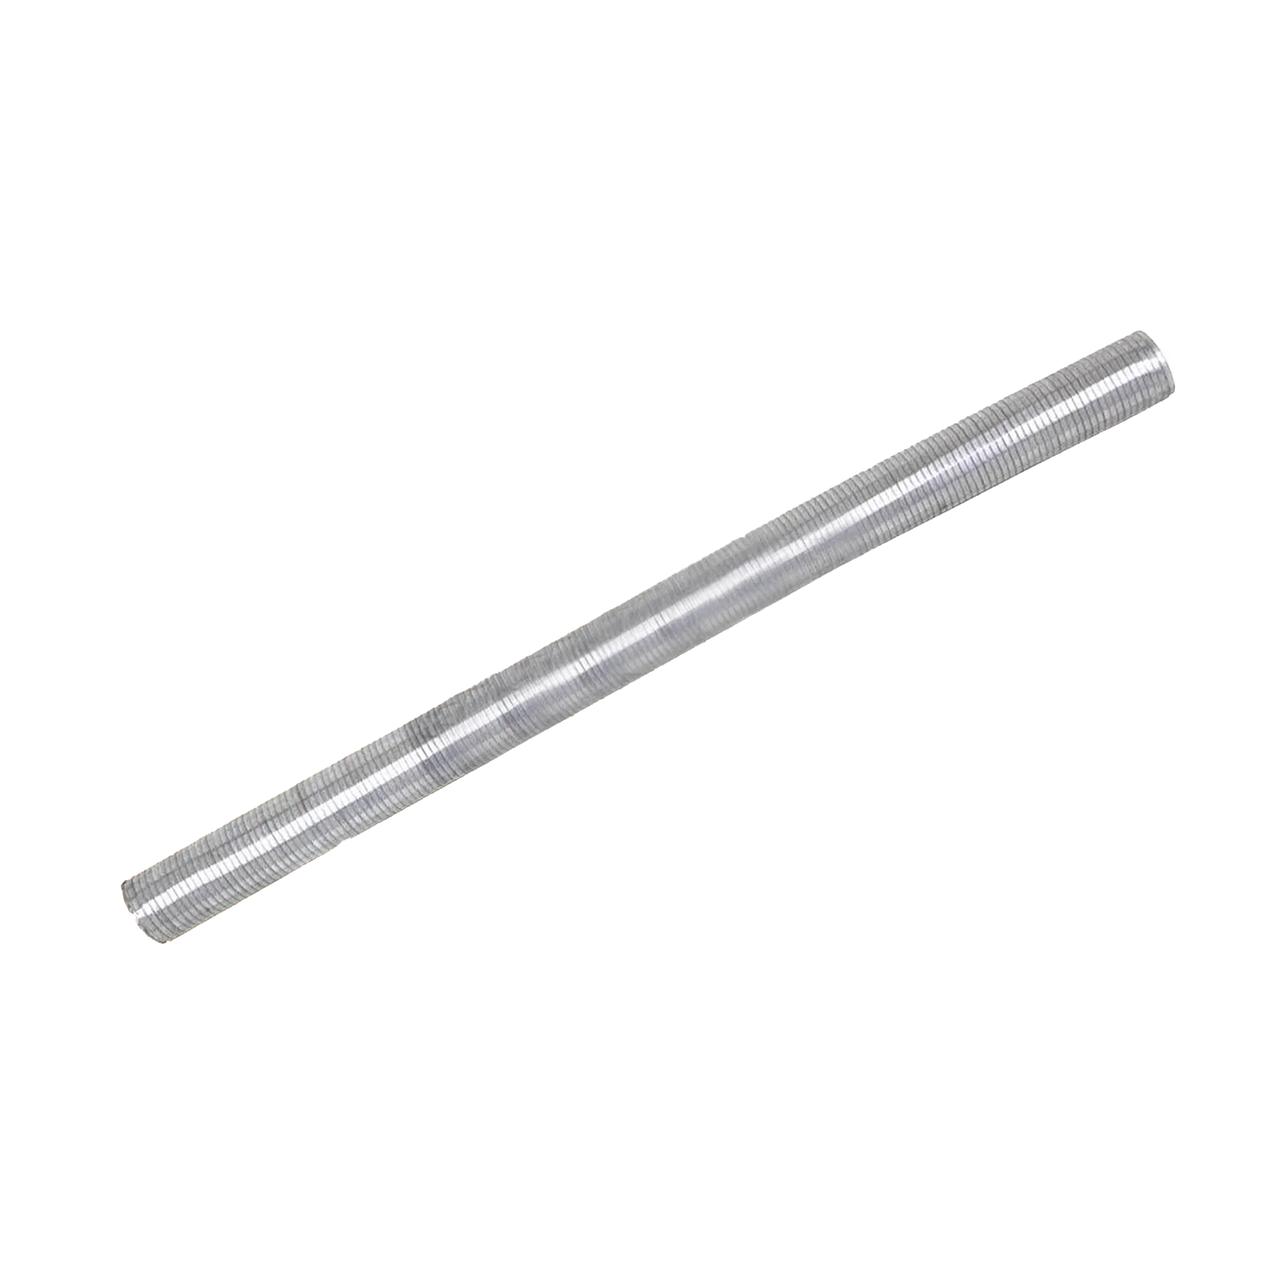 Гофрированная труба оцинкованная сталь 60 мм 1м без фланцев